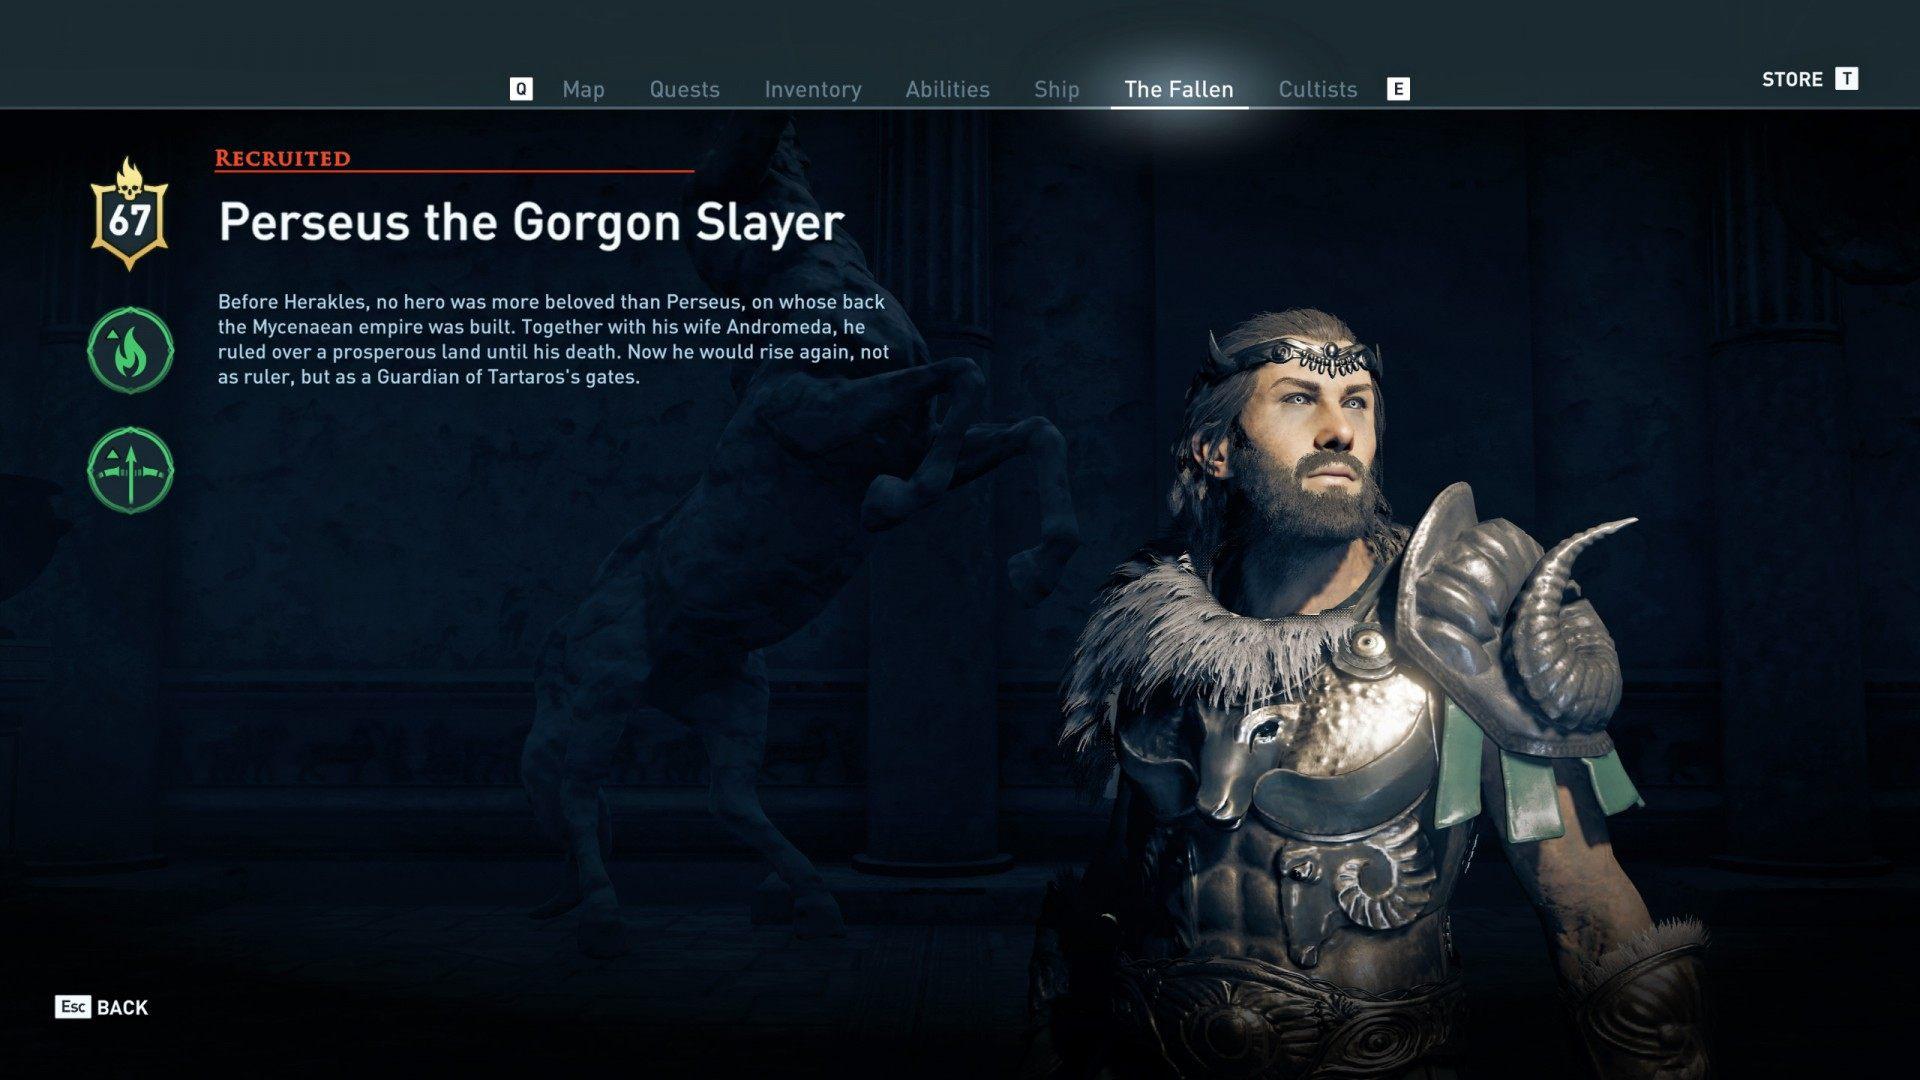 The Underworld S Fallen Guardians Assassin S Creed Odyssey Quest